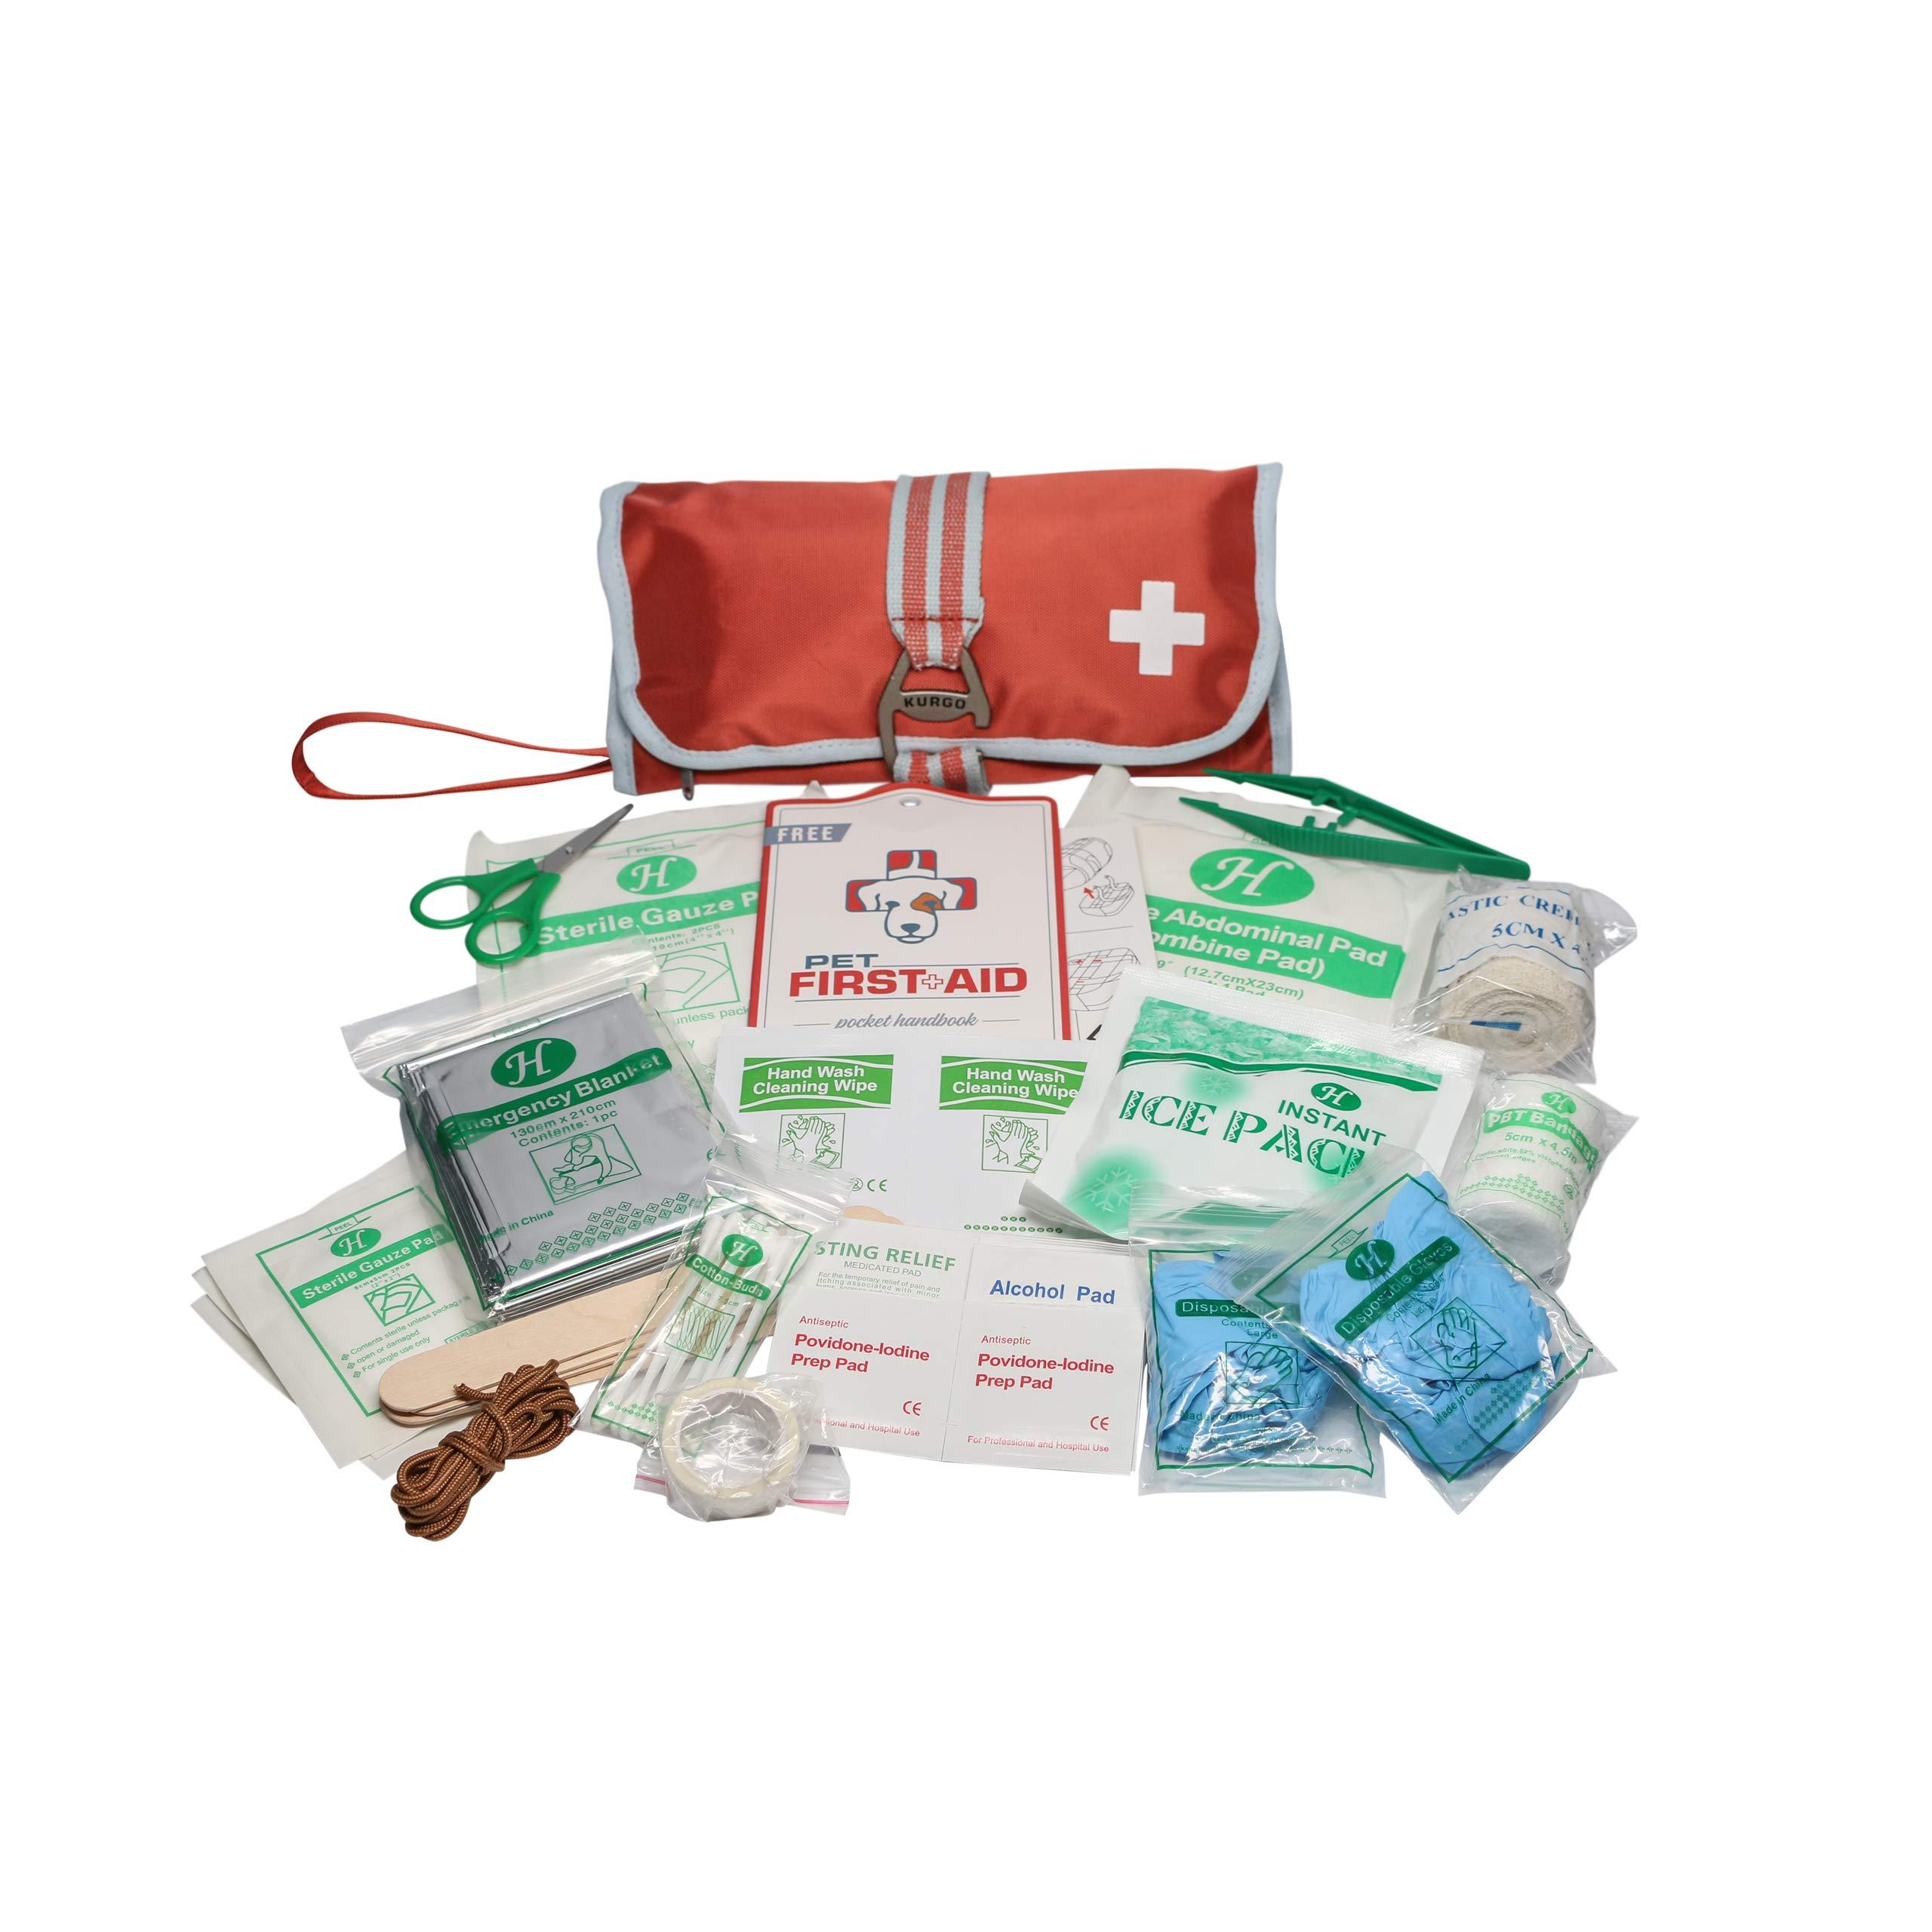 Kurgo Portable Dog First Aid Kit, Pet Medical Kit (50 Piece), One Size, Paprika by Kurgo